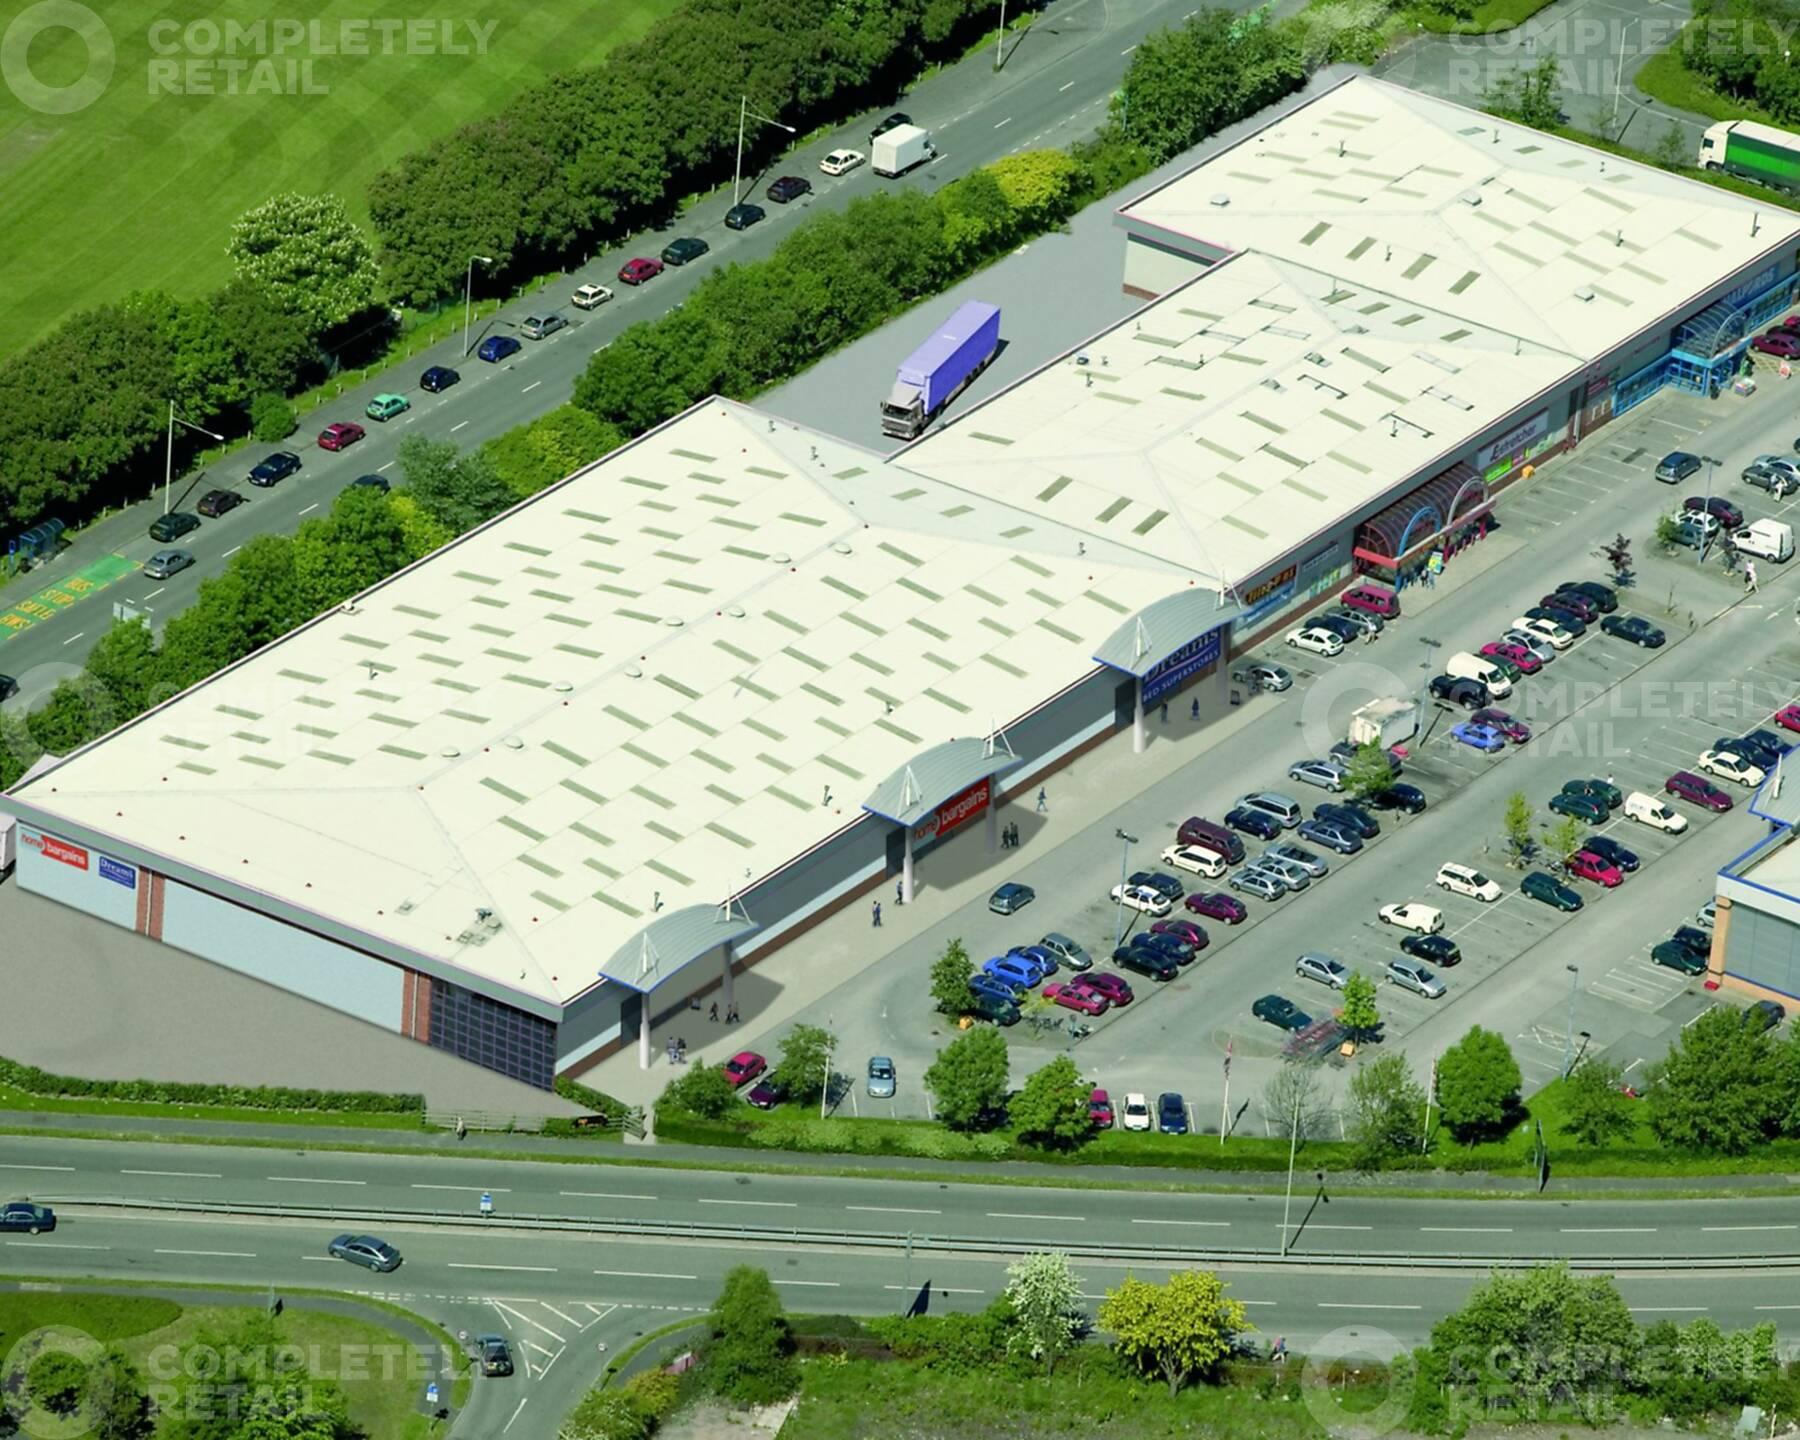 Pentrebach Retail Park